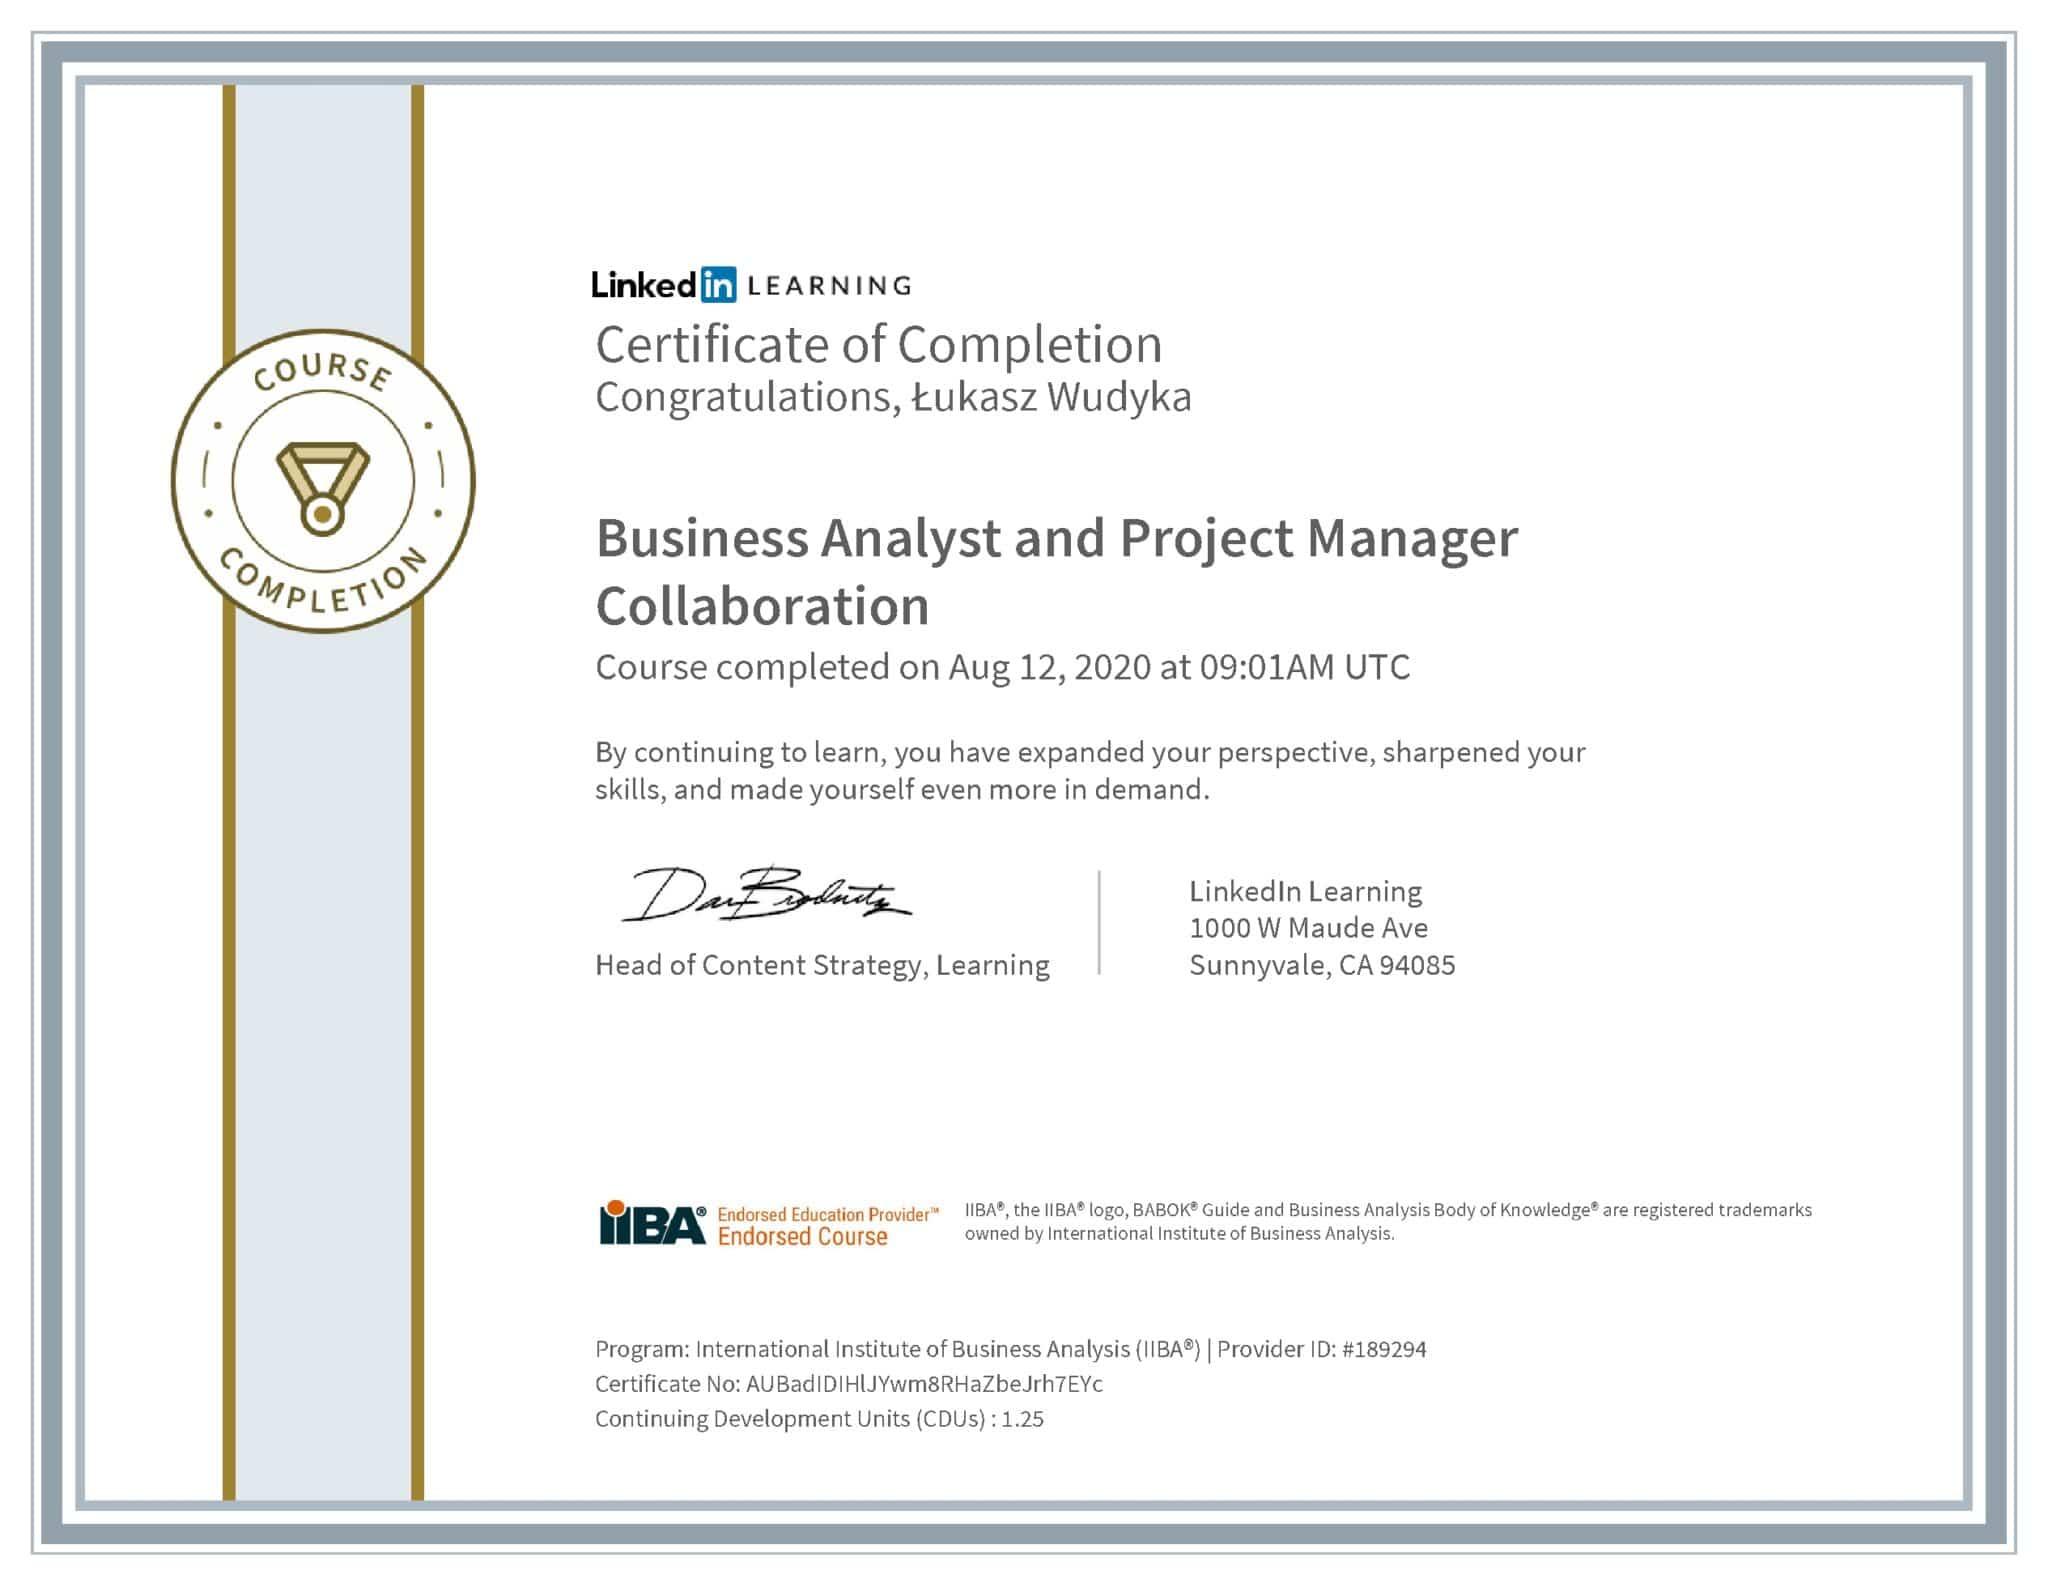 Łukasz Wudyka certyfikat LinkedIn Business Analyst and Project Manager Callaboration IIBA